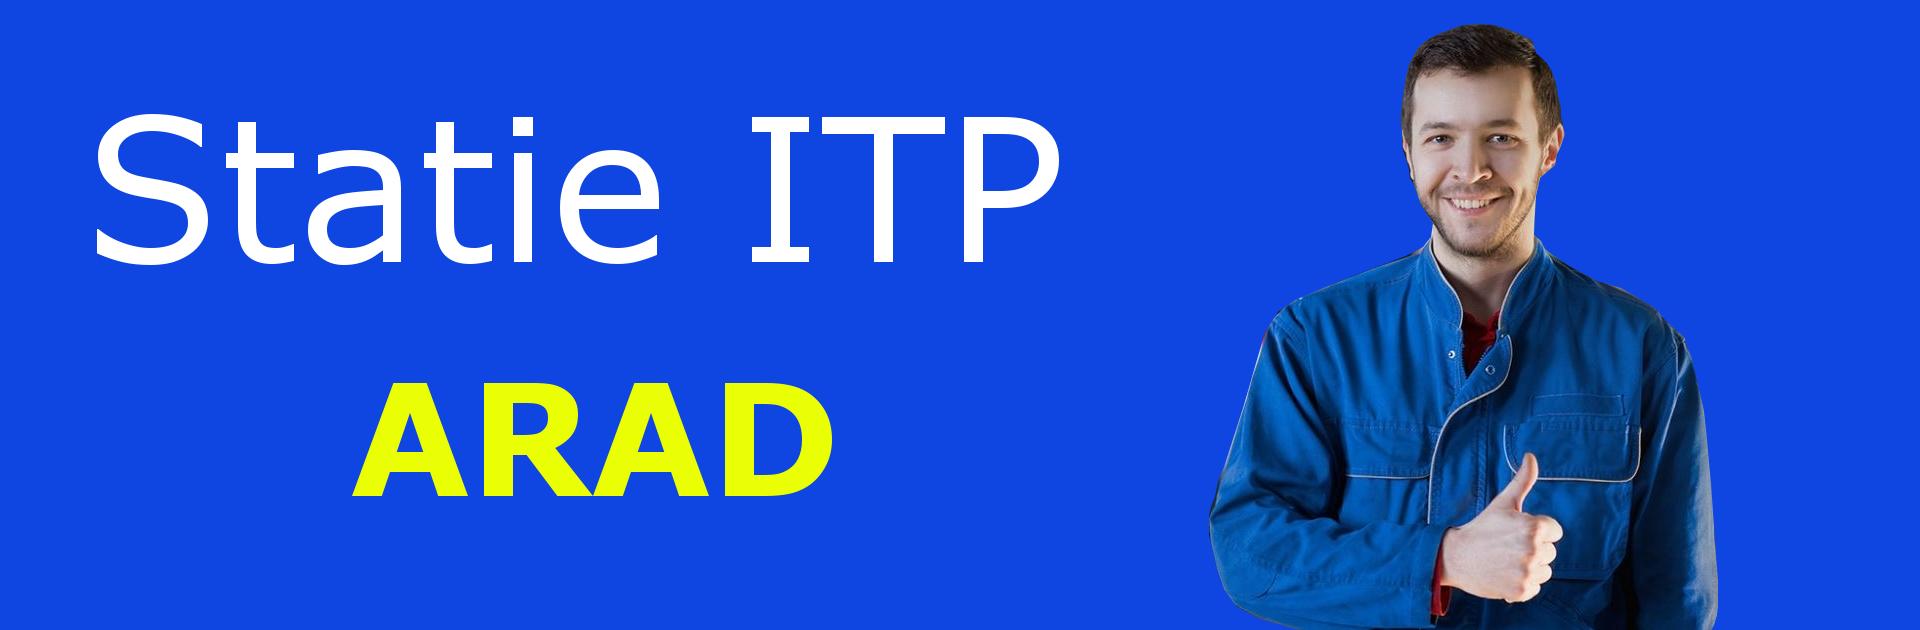 Banner ITP ARAD